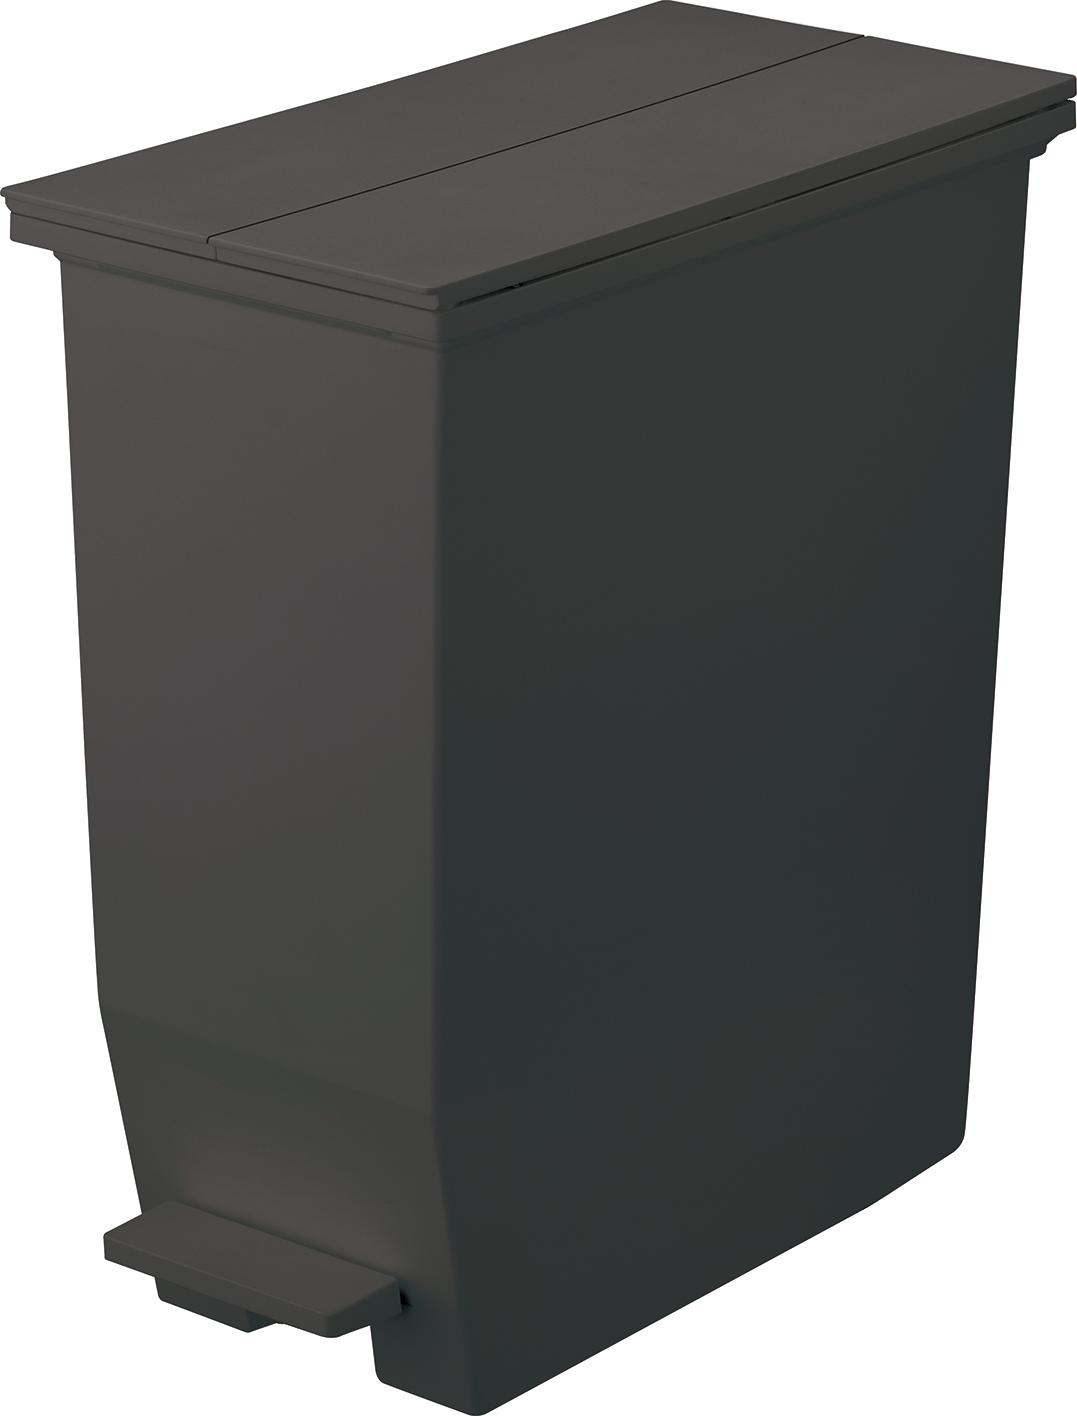 35L ブラック 扉閉じた状態